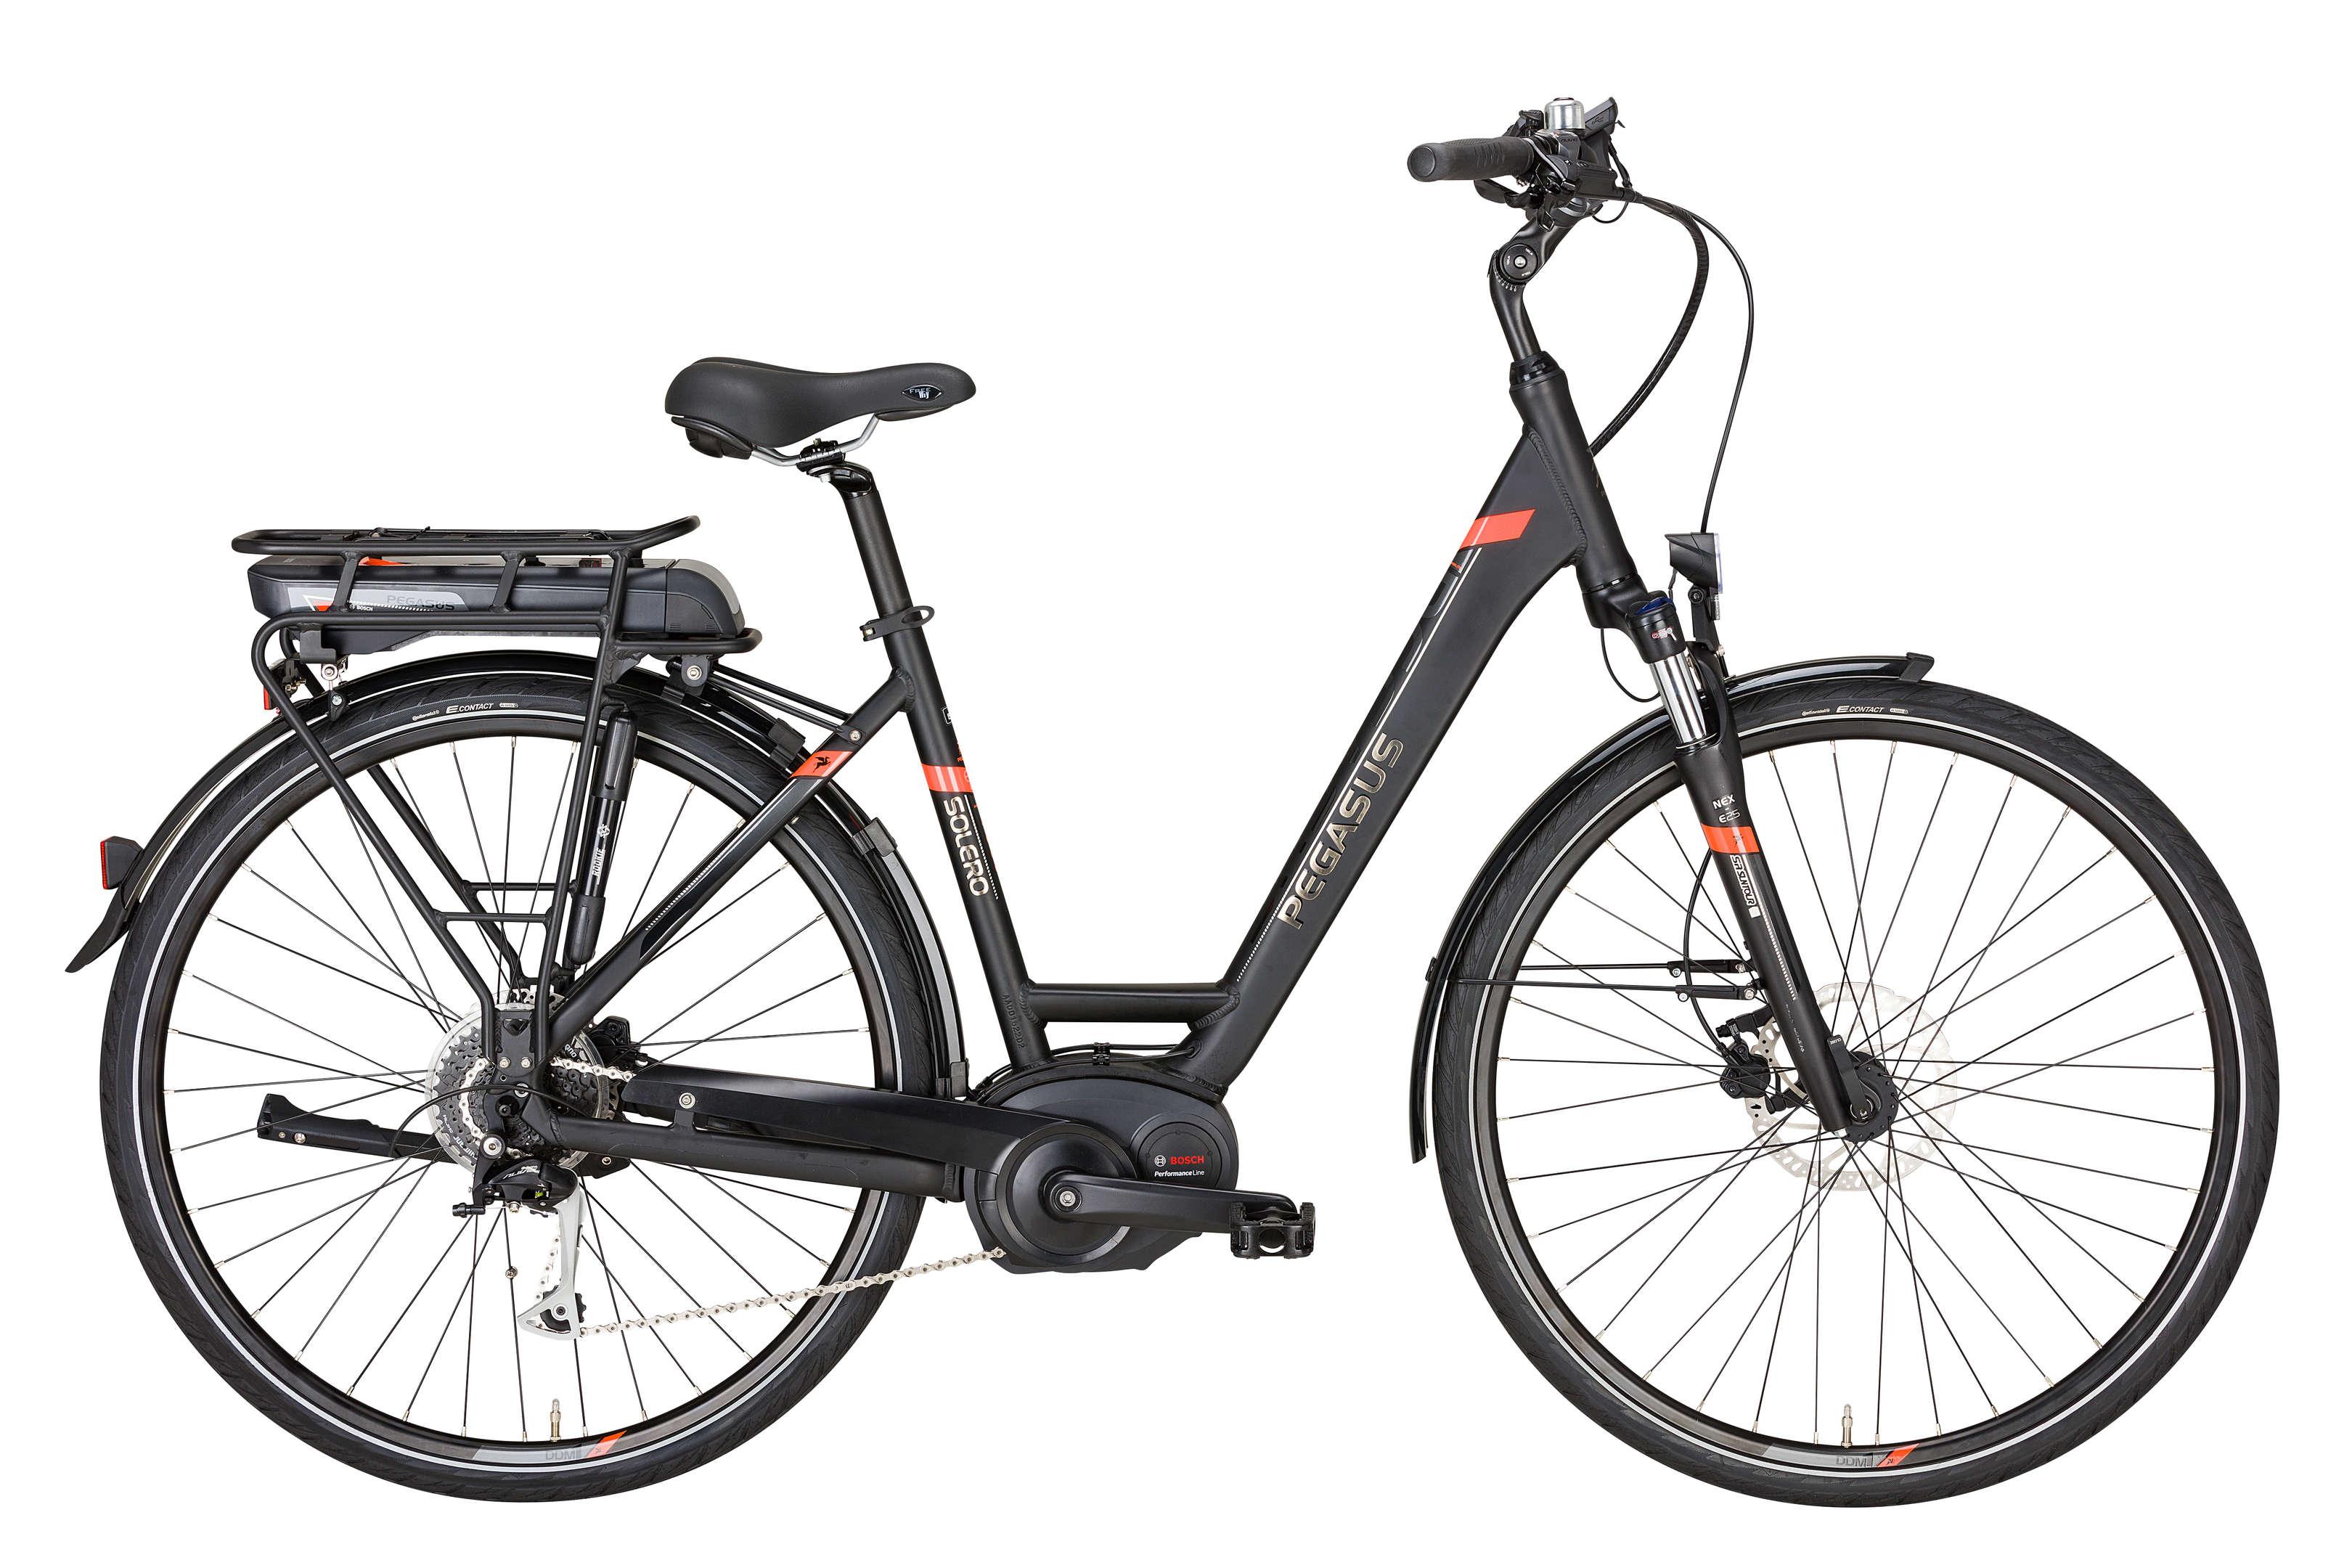 pegasus e bike solero e9 lt eurorad bikeleasingeurorad. Black Bedroom Furniture Sets. Home Design Ideas